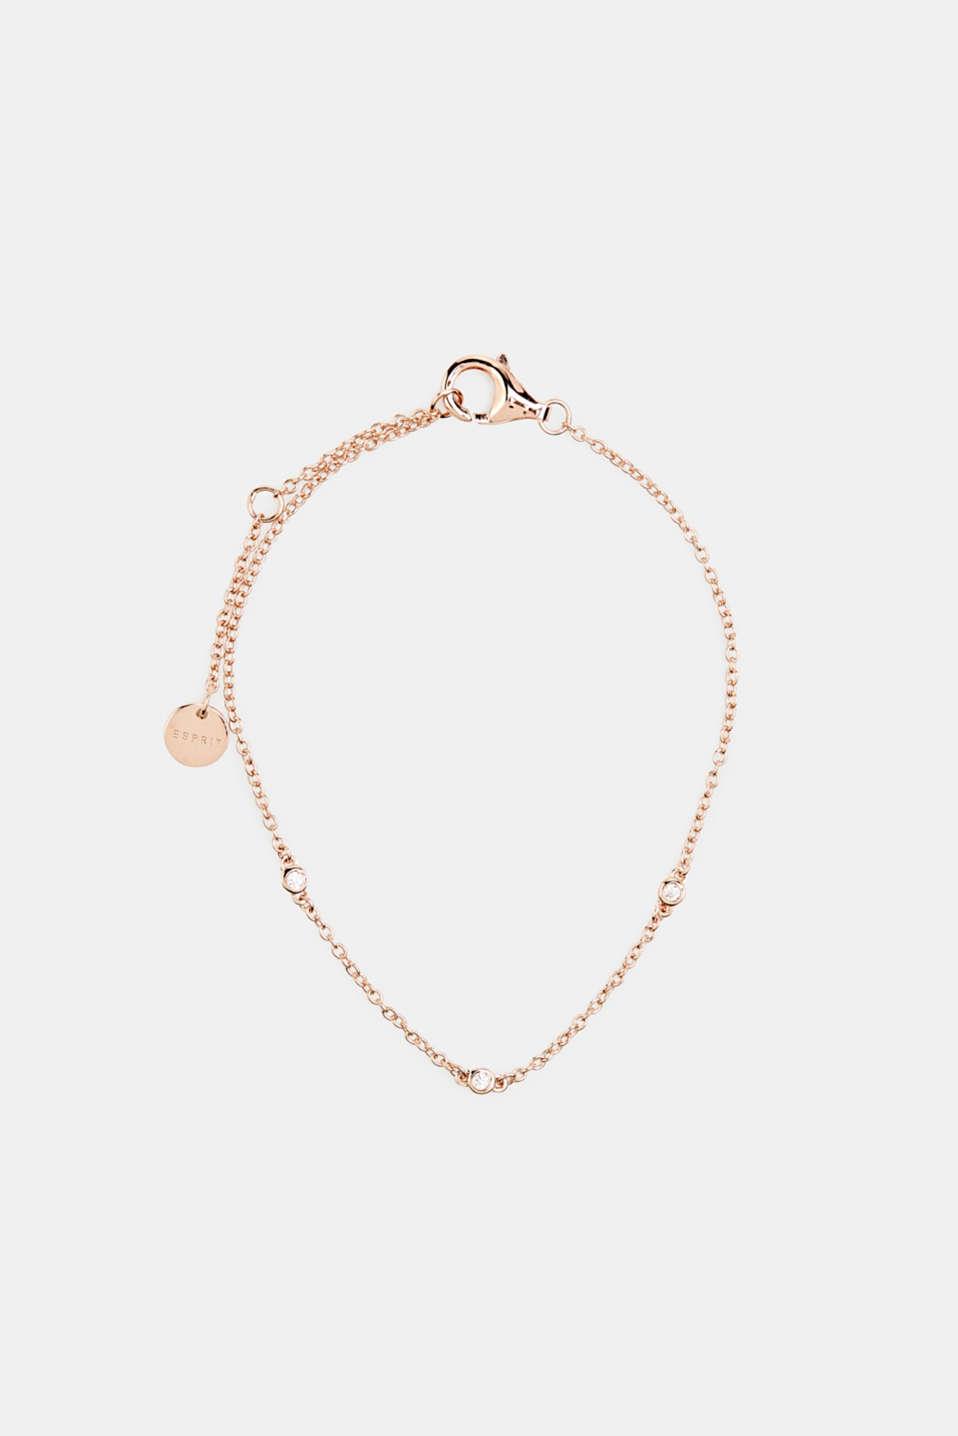 Bracelet with zirconia, sterling silver, LCROSEGOLD, detail image number 0